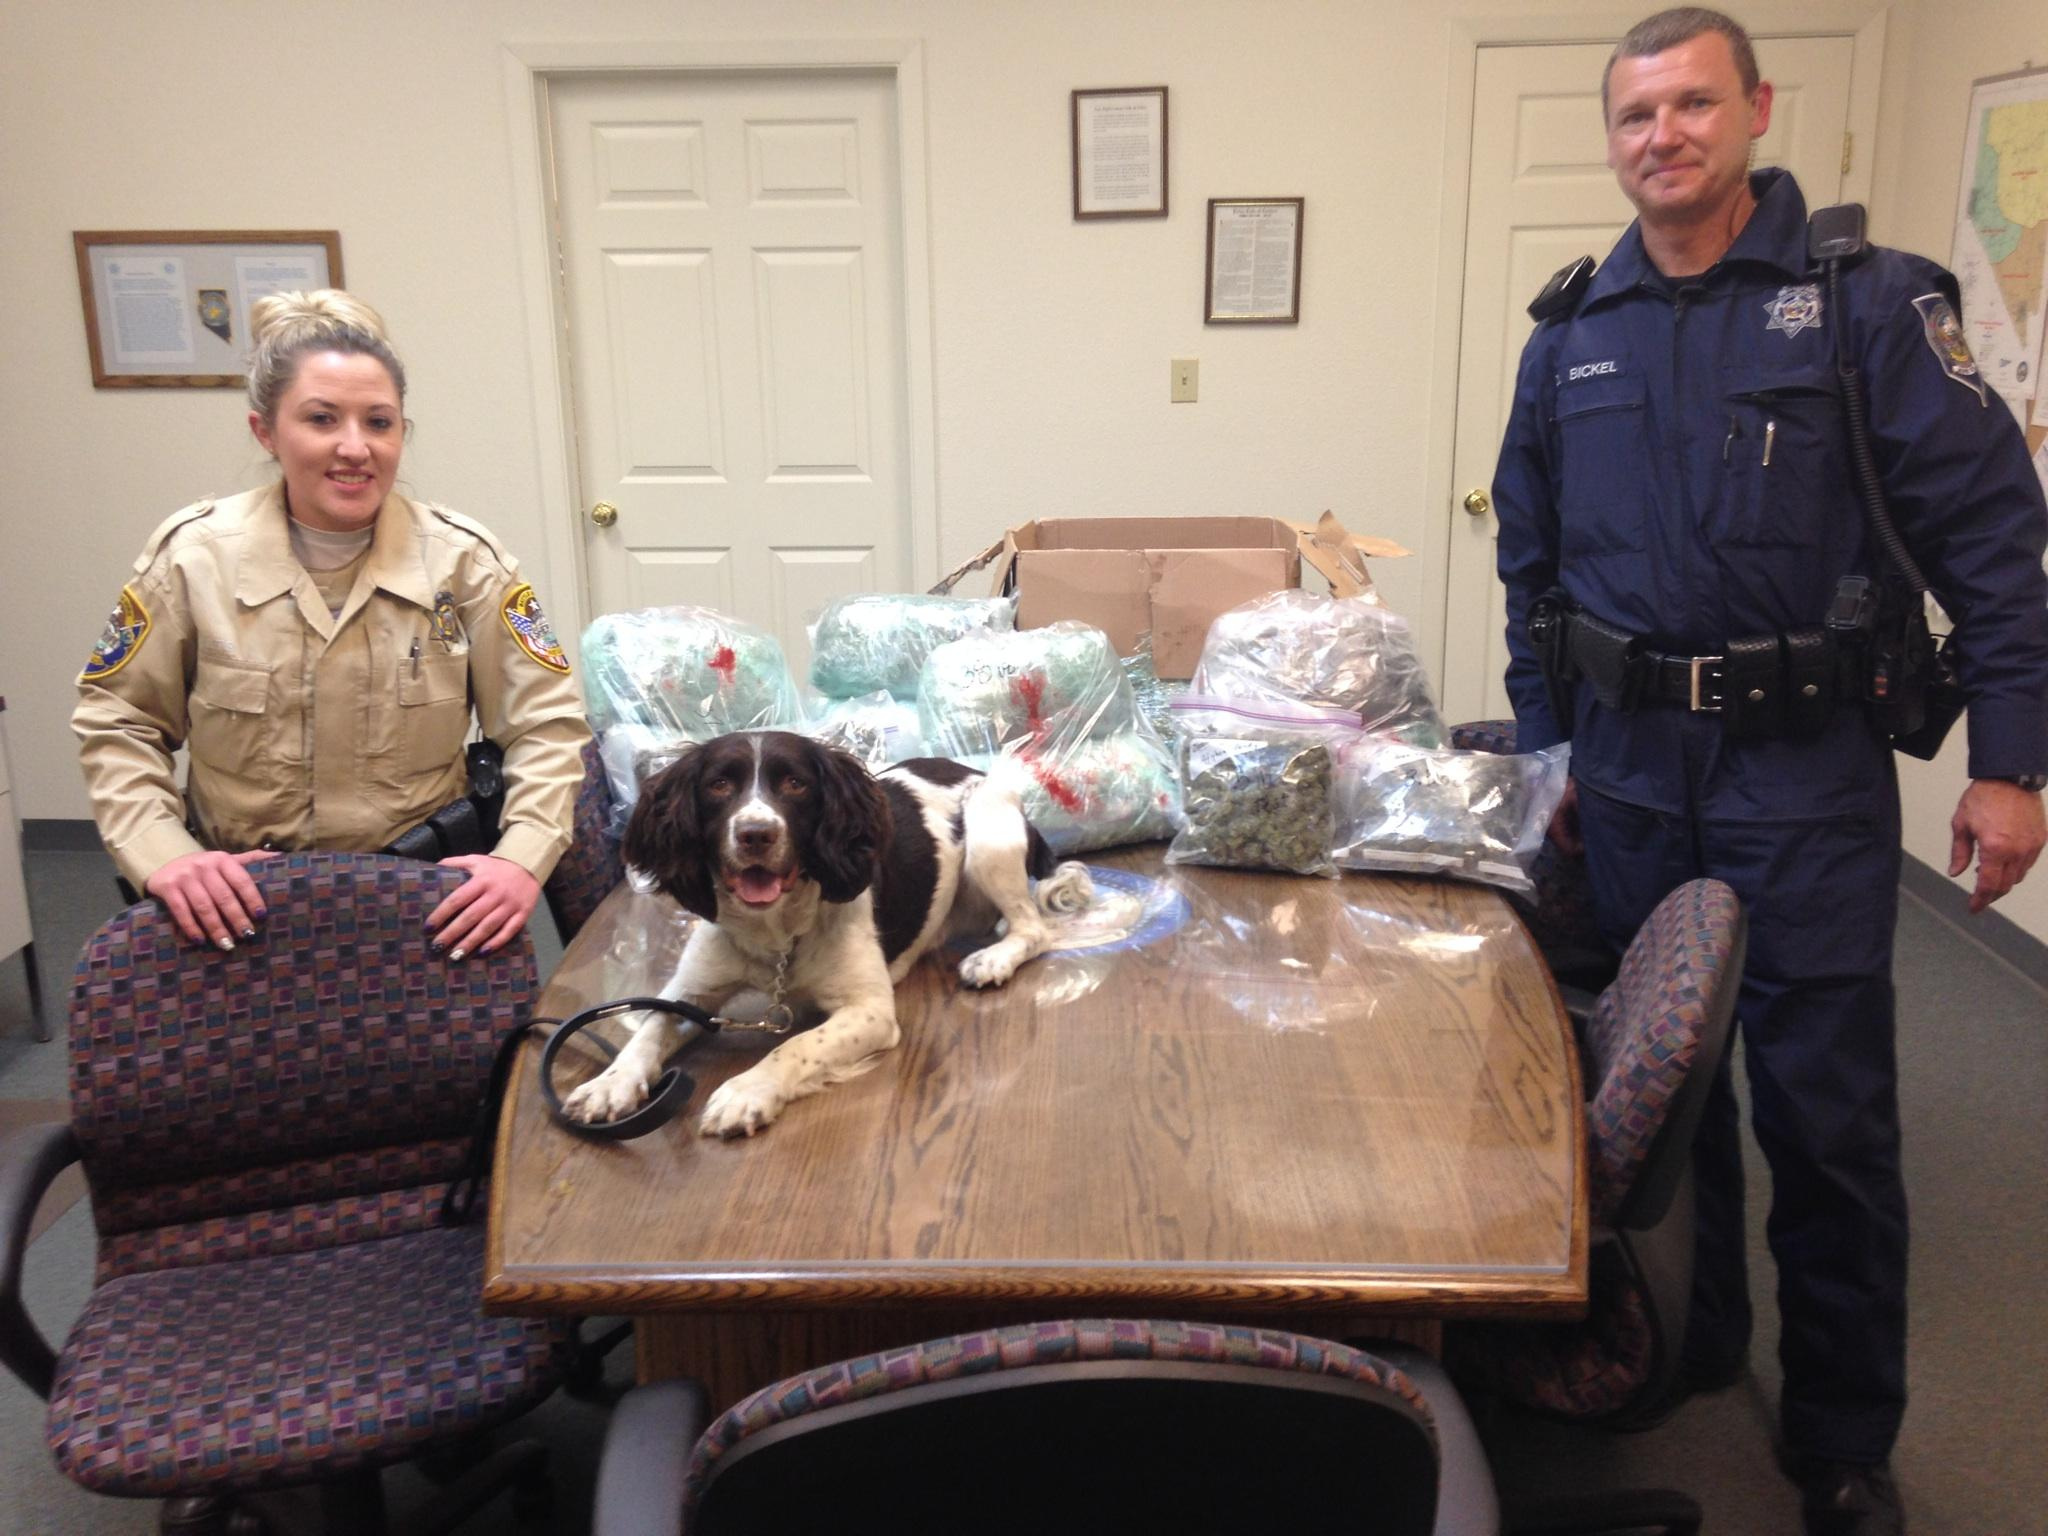 Man arrested in Hawthorne for transporting marijuana